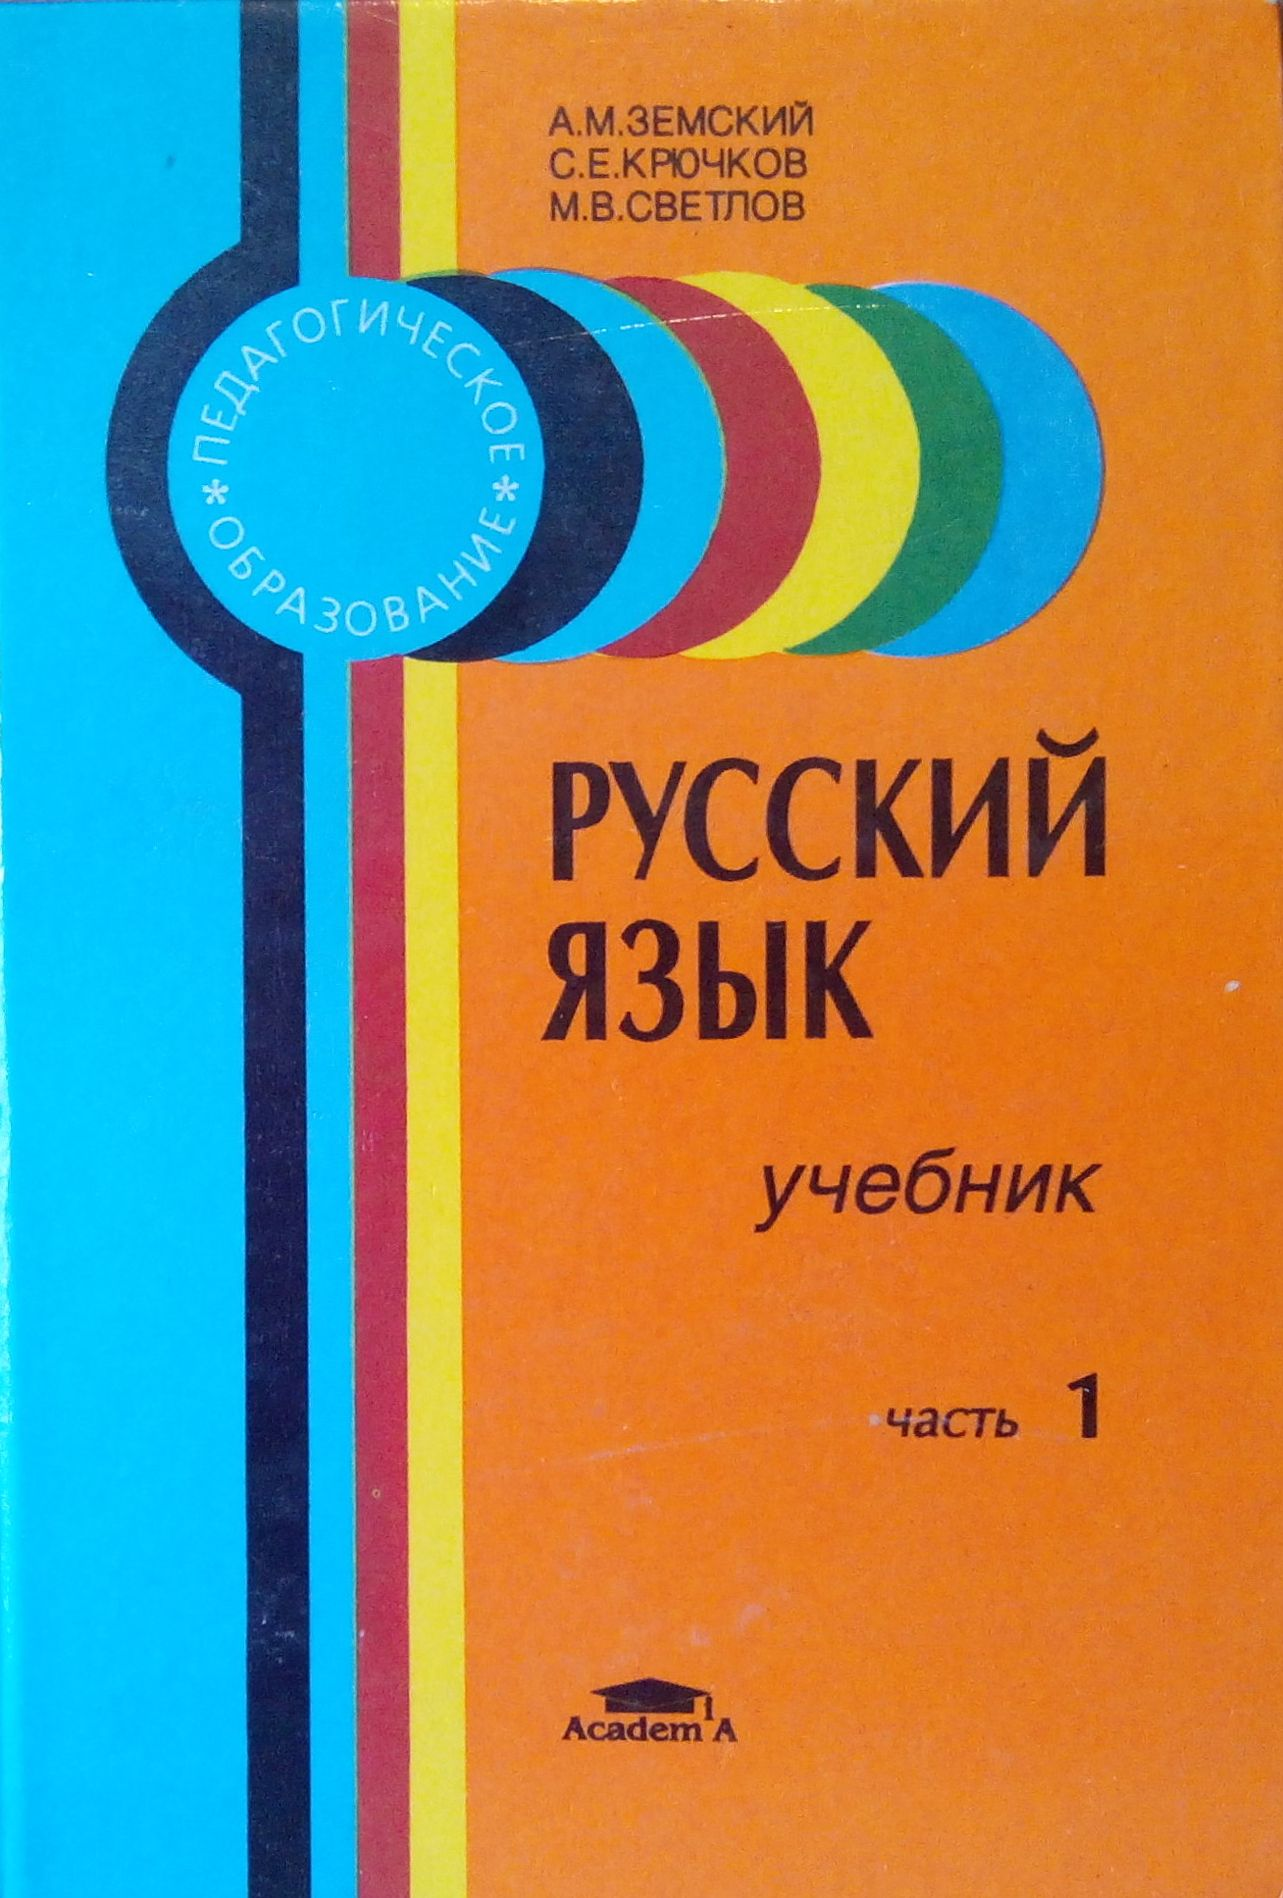 Гдз По Русскому Языку Онлайн Земский